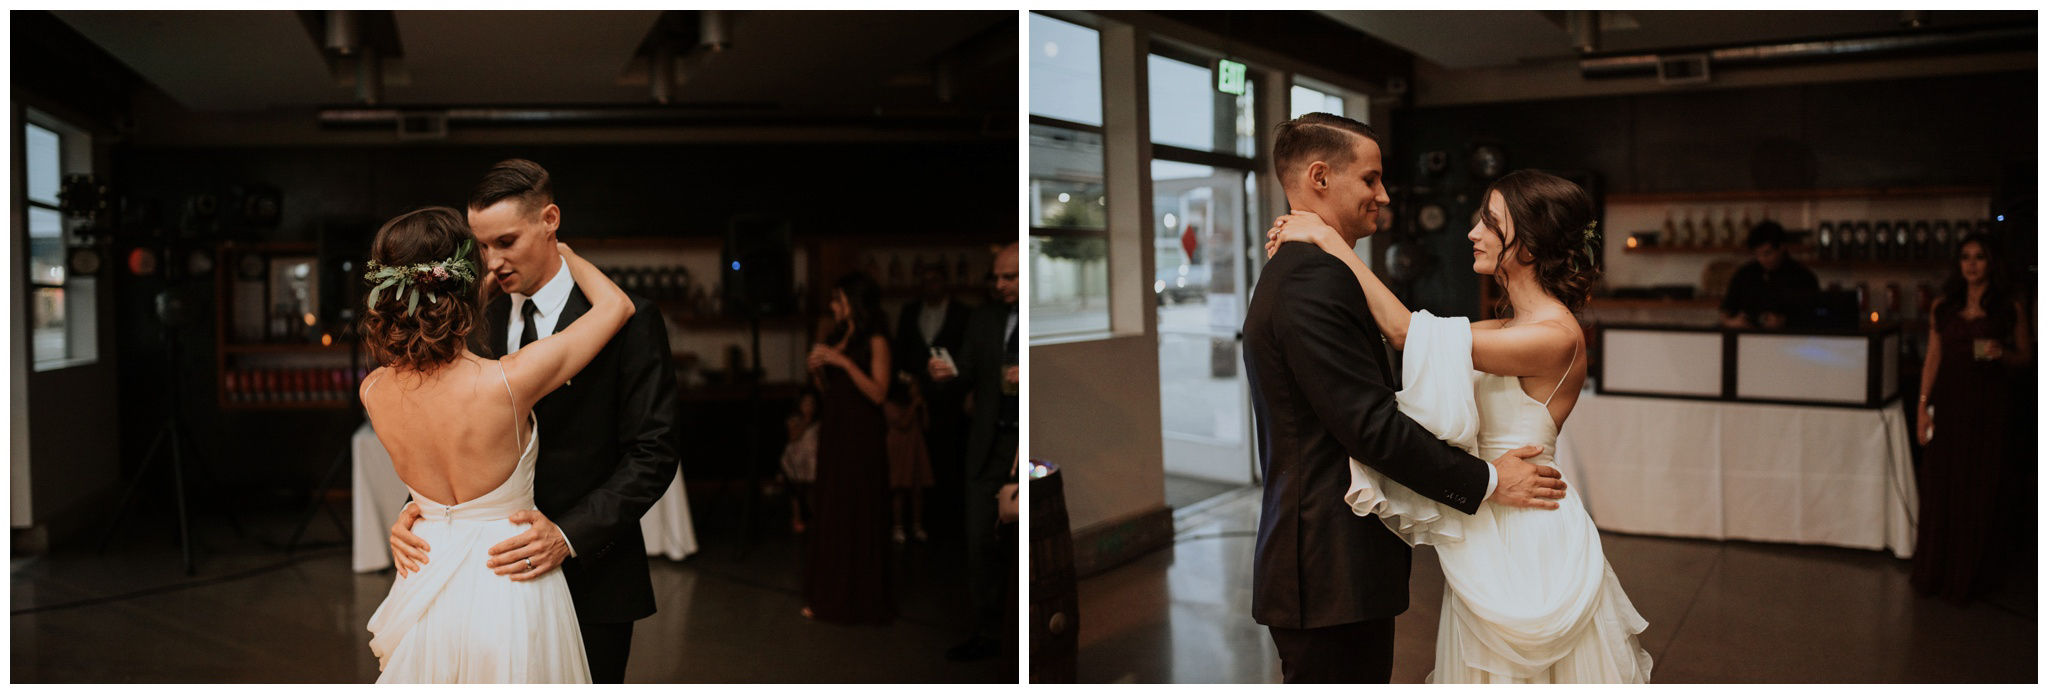 alyssa-keiran-westland-distillery-urban-seattle-wedding-photographer-caitlyn-nikula-147.jpg